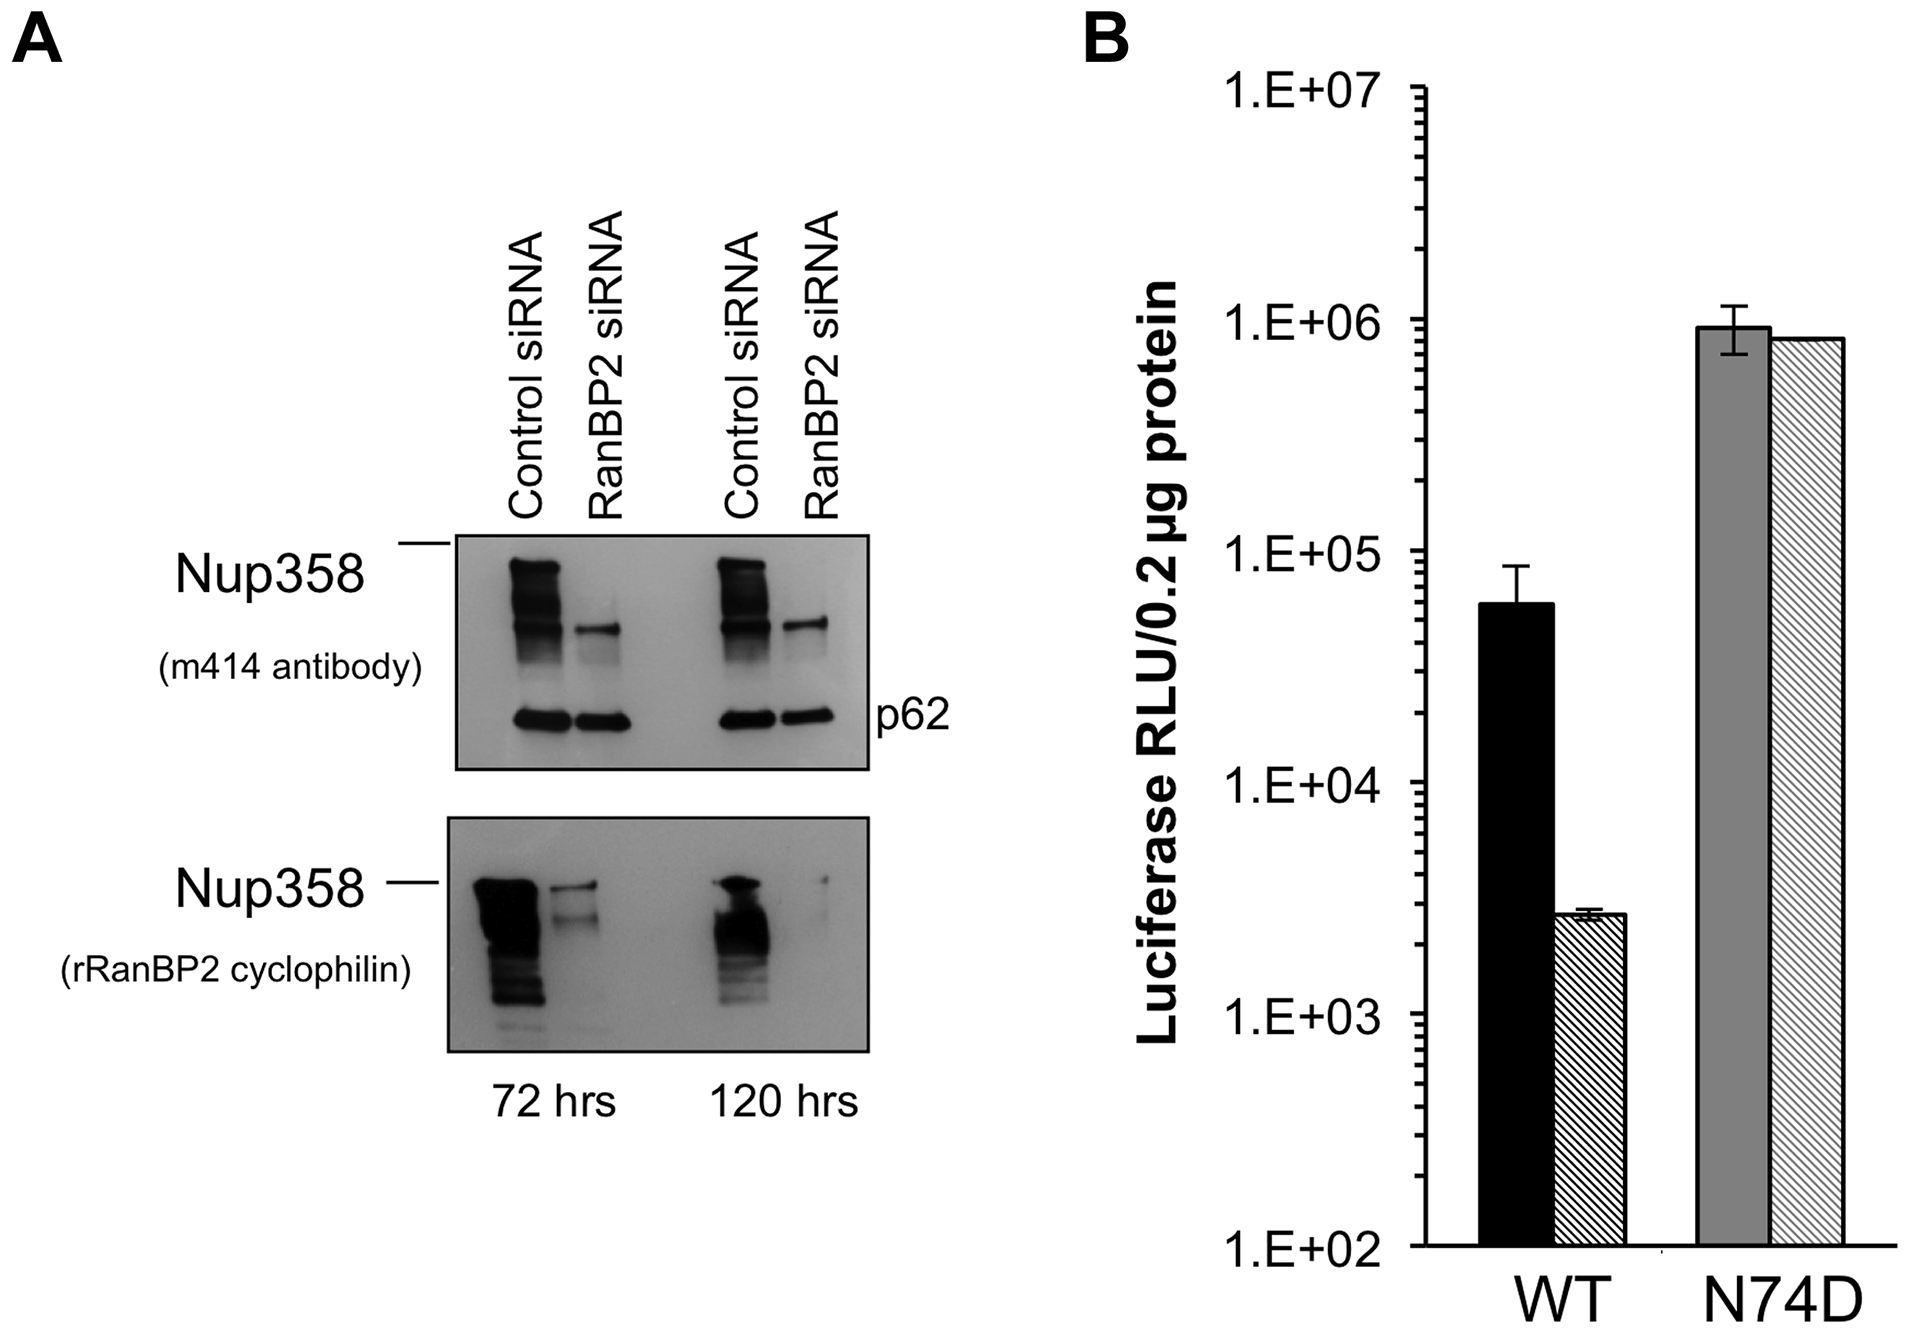 Acute depletion of Nup358 in Hela cells.